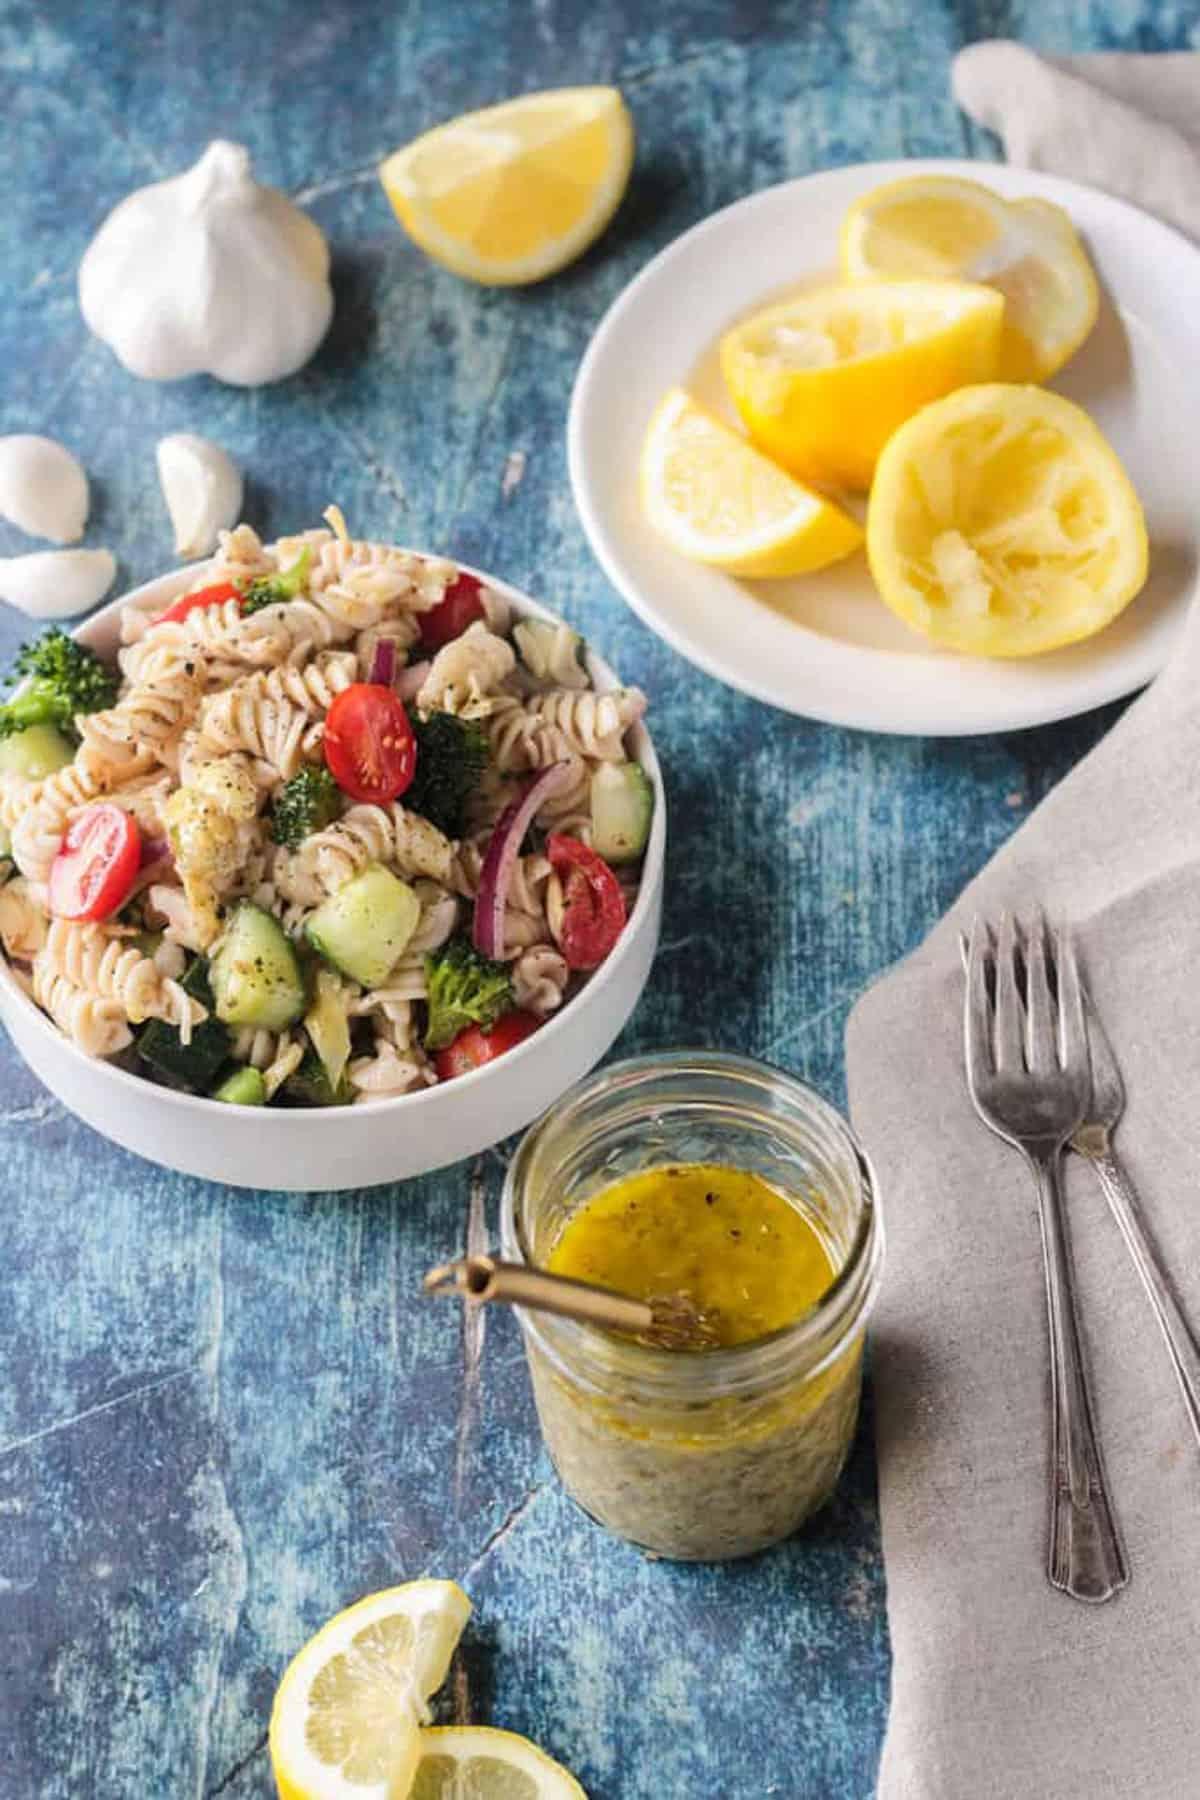 Small bowl of pasta salad next to a jar of vinaigrette and lemon slices.